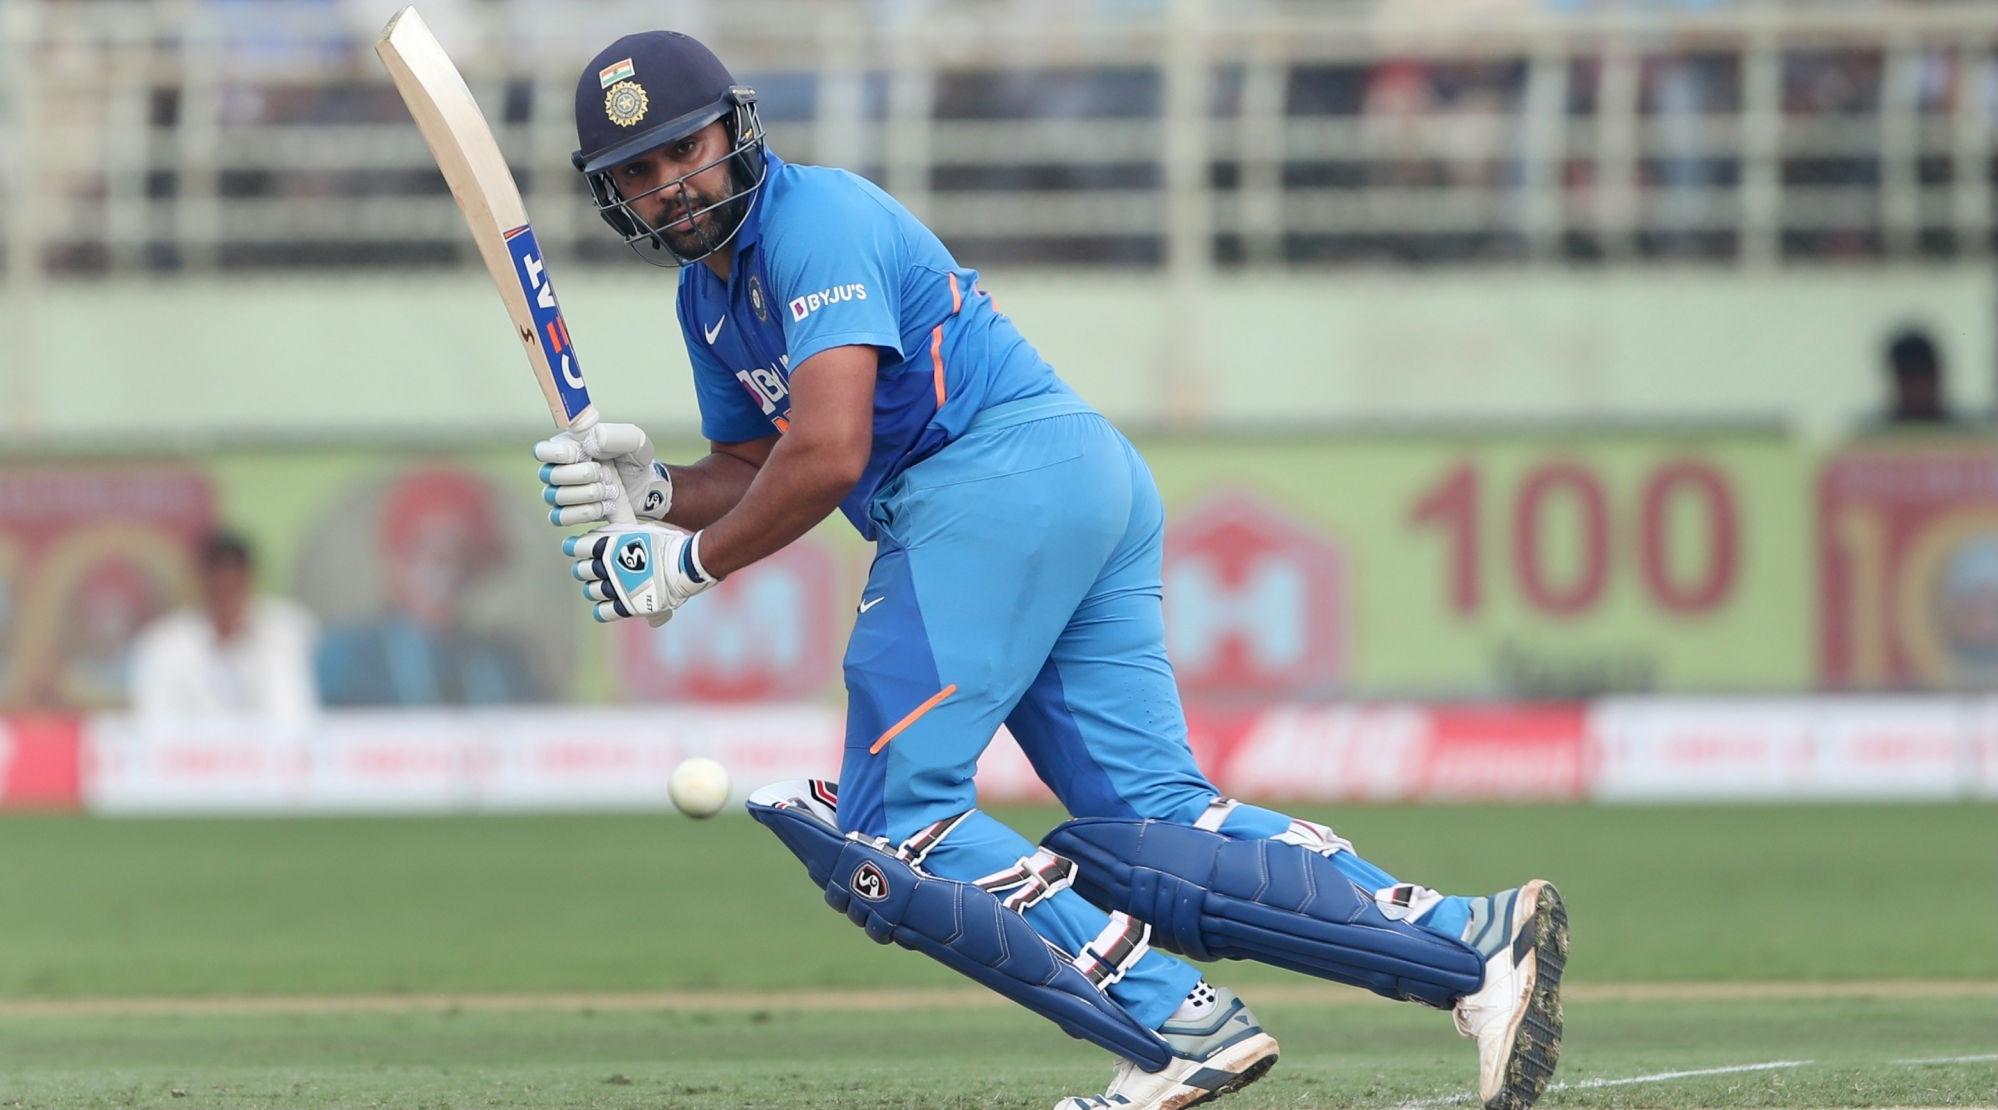 Rohit Sharma Becomes Third-Fastest Batsman to Reach 9000 Runs in One Day Internationals, Reaches Landmark During India vs Australia 3rd ODI 2020